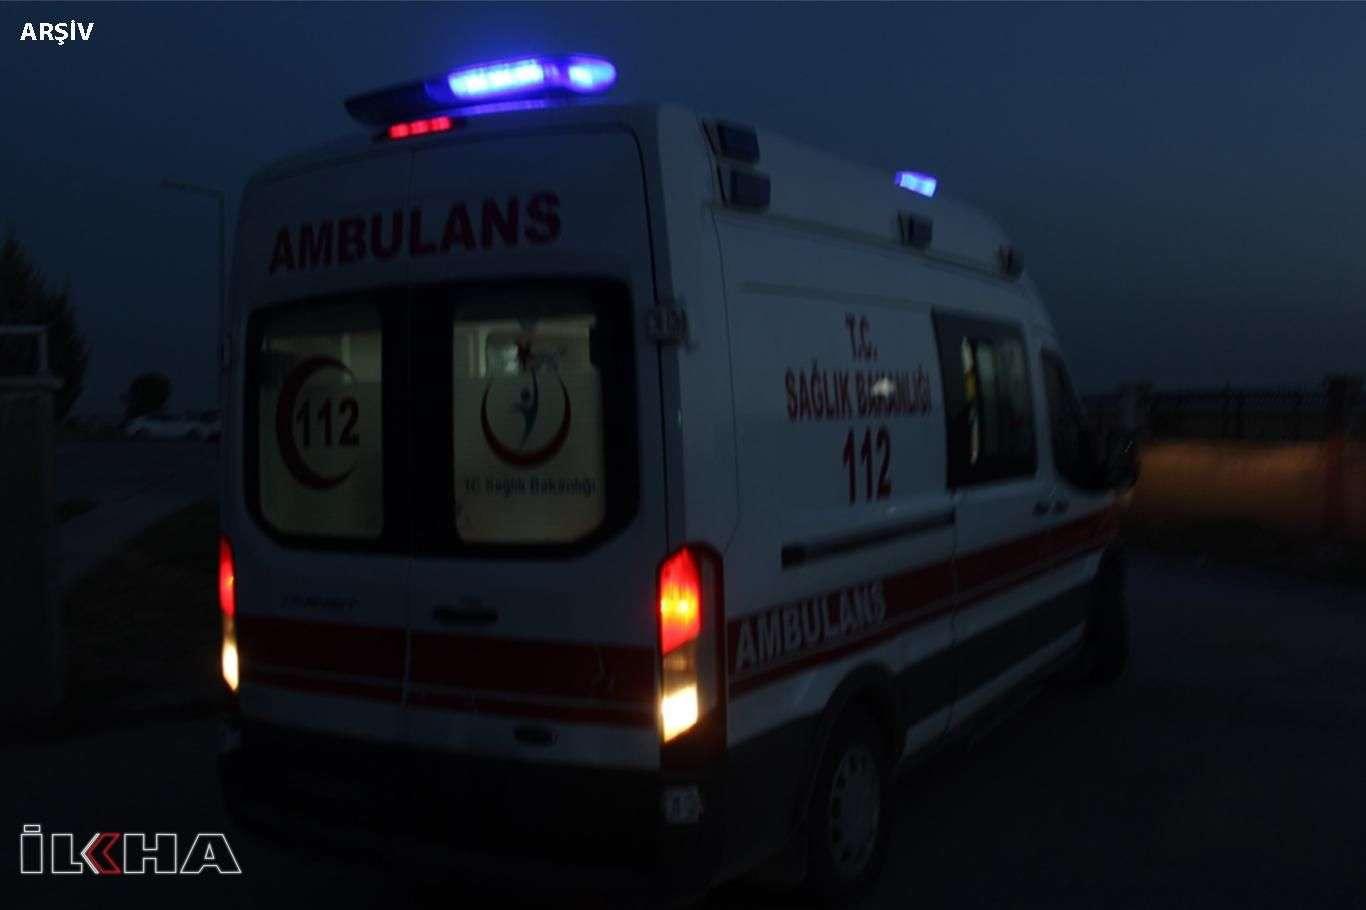 Manisa'da 4 Genç Cesedi Bulundu